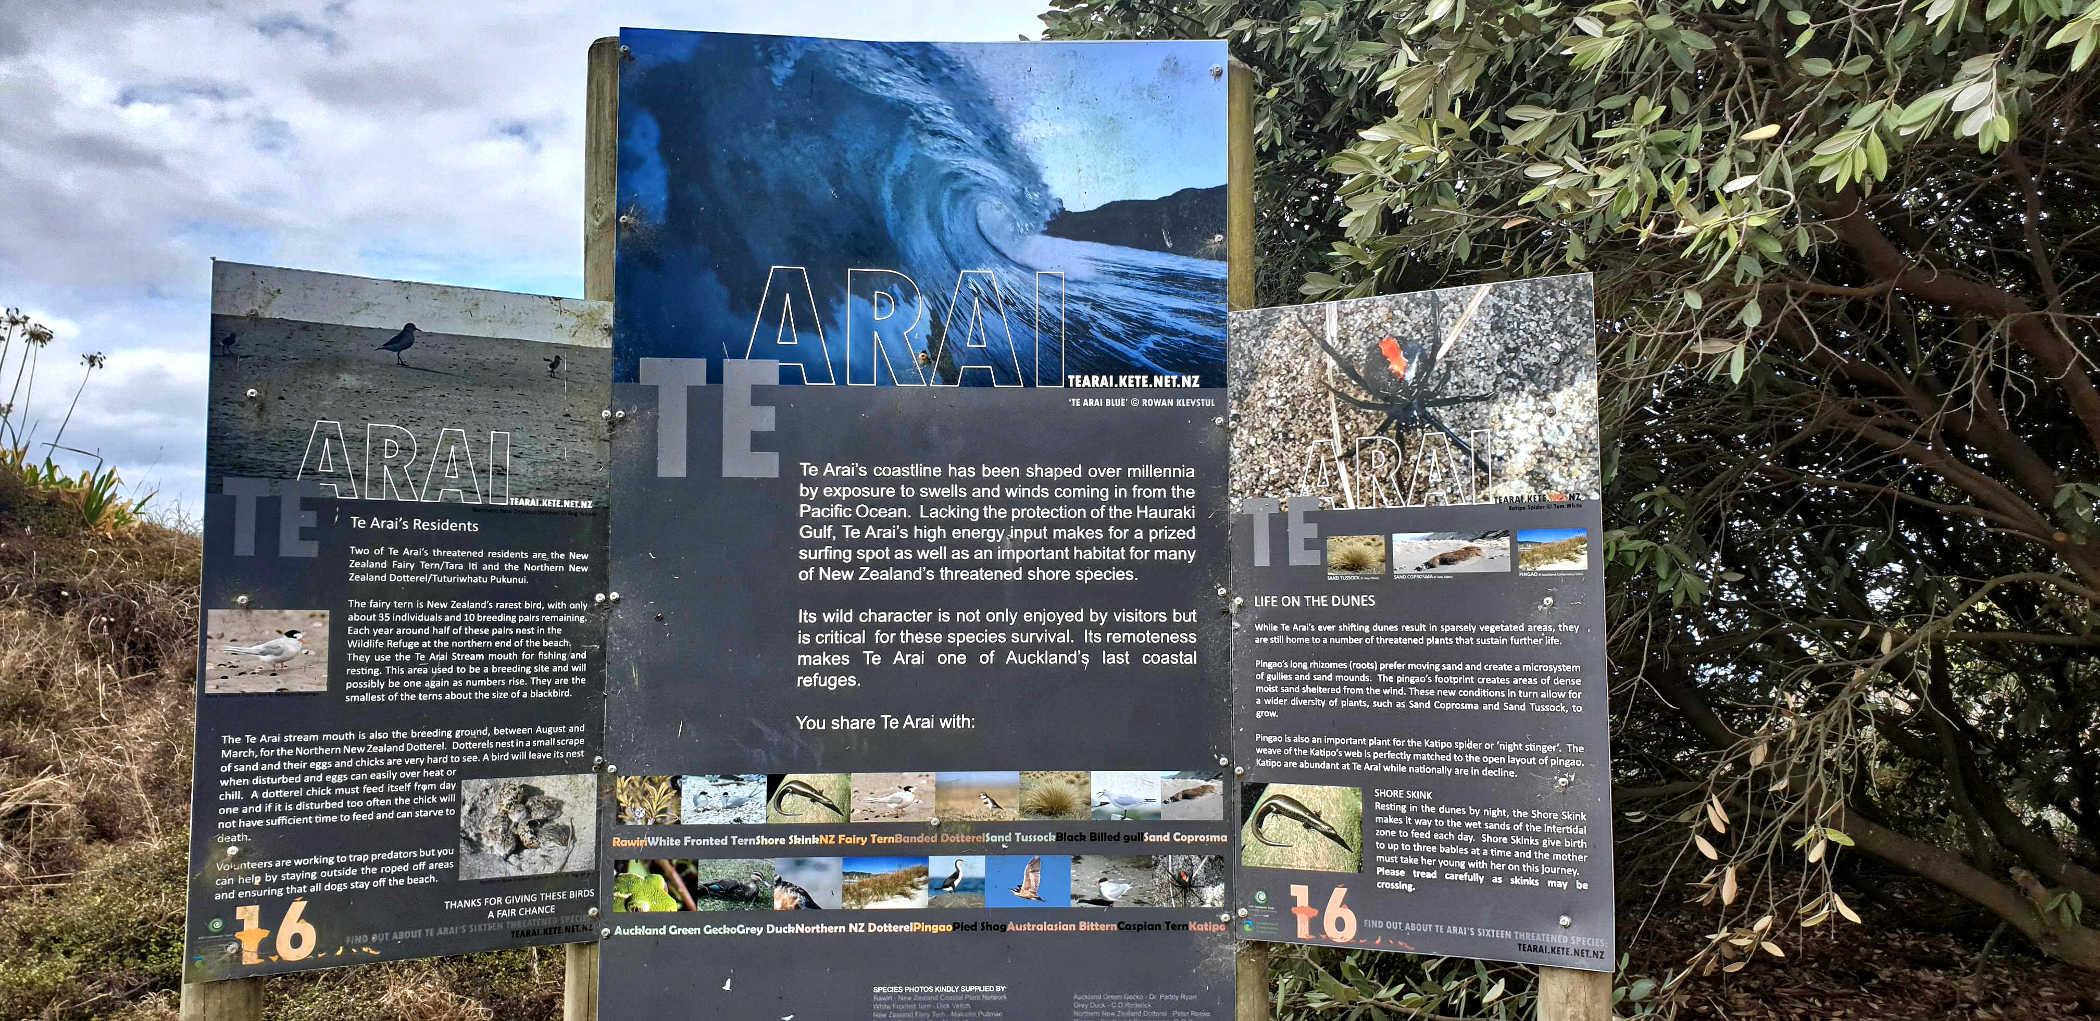 Coastal dunes and Te Arai wildlife